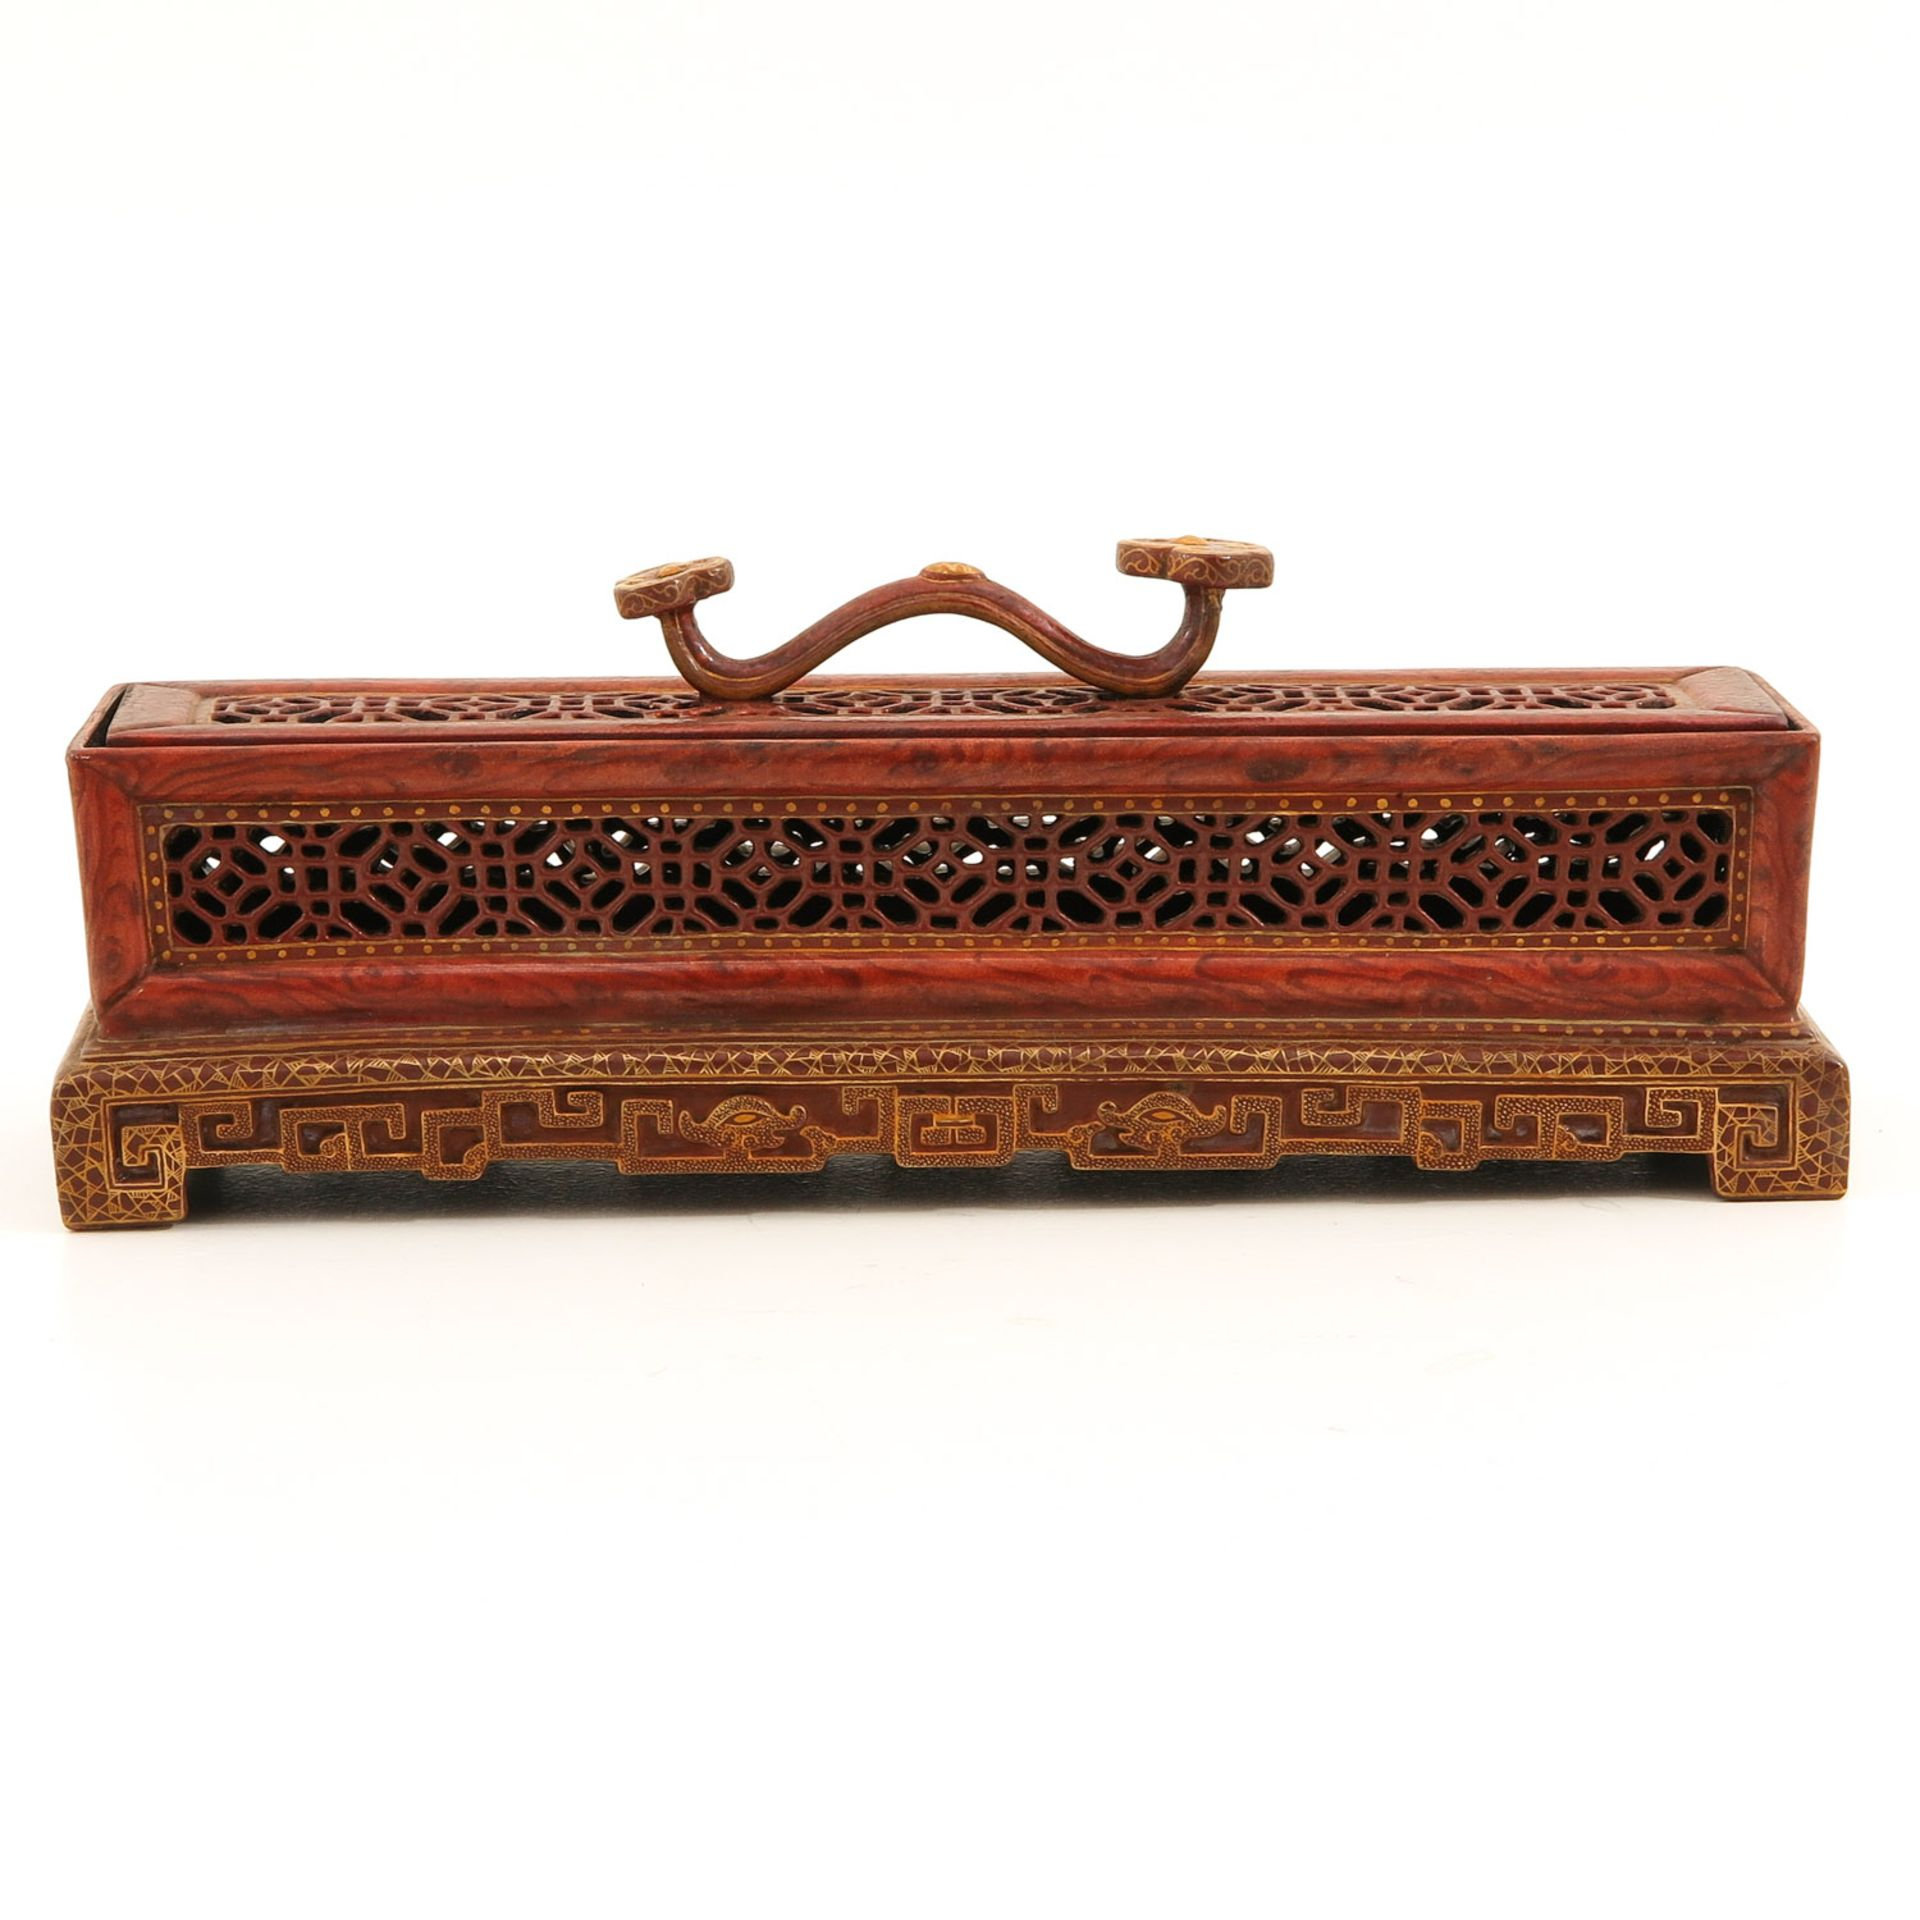 Los 7033 - A Orange and Gilt Box